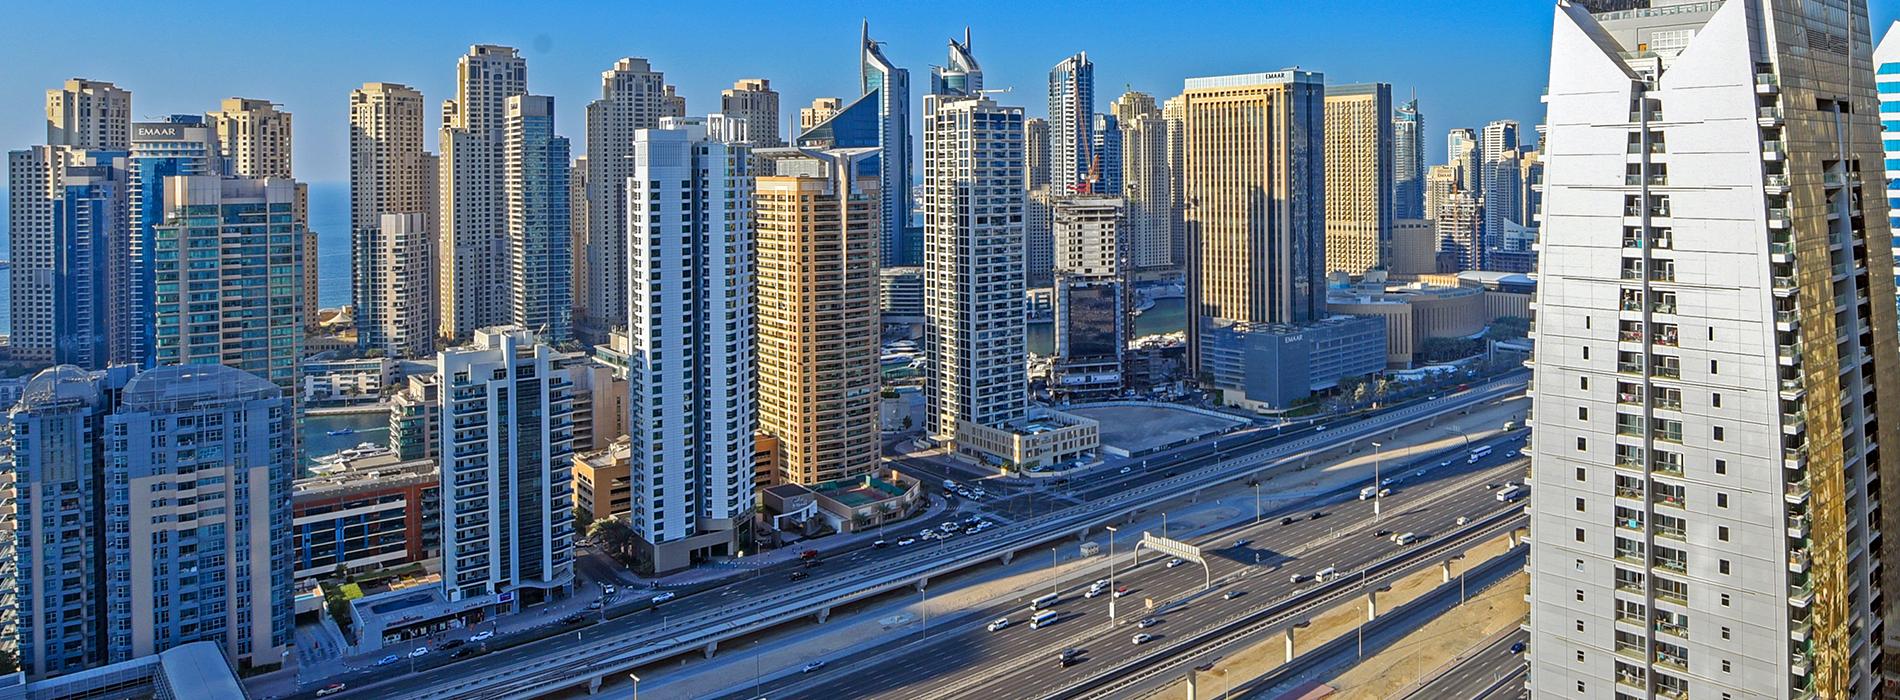 Is Moving to Dubai a Good Choice?